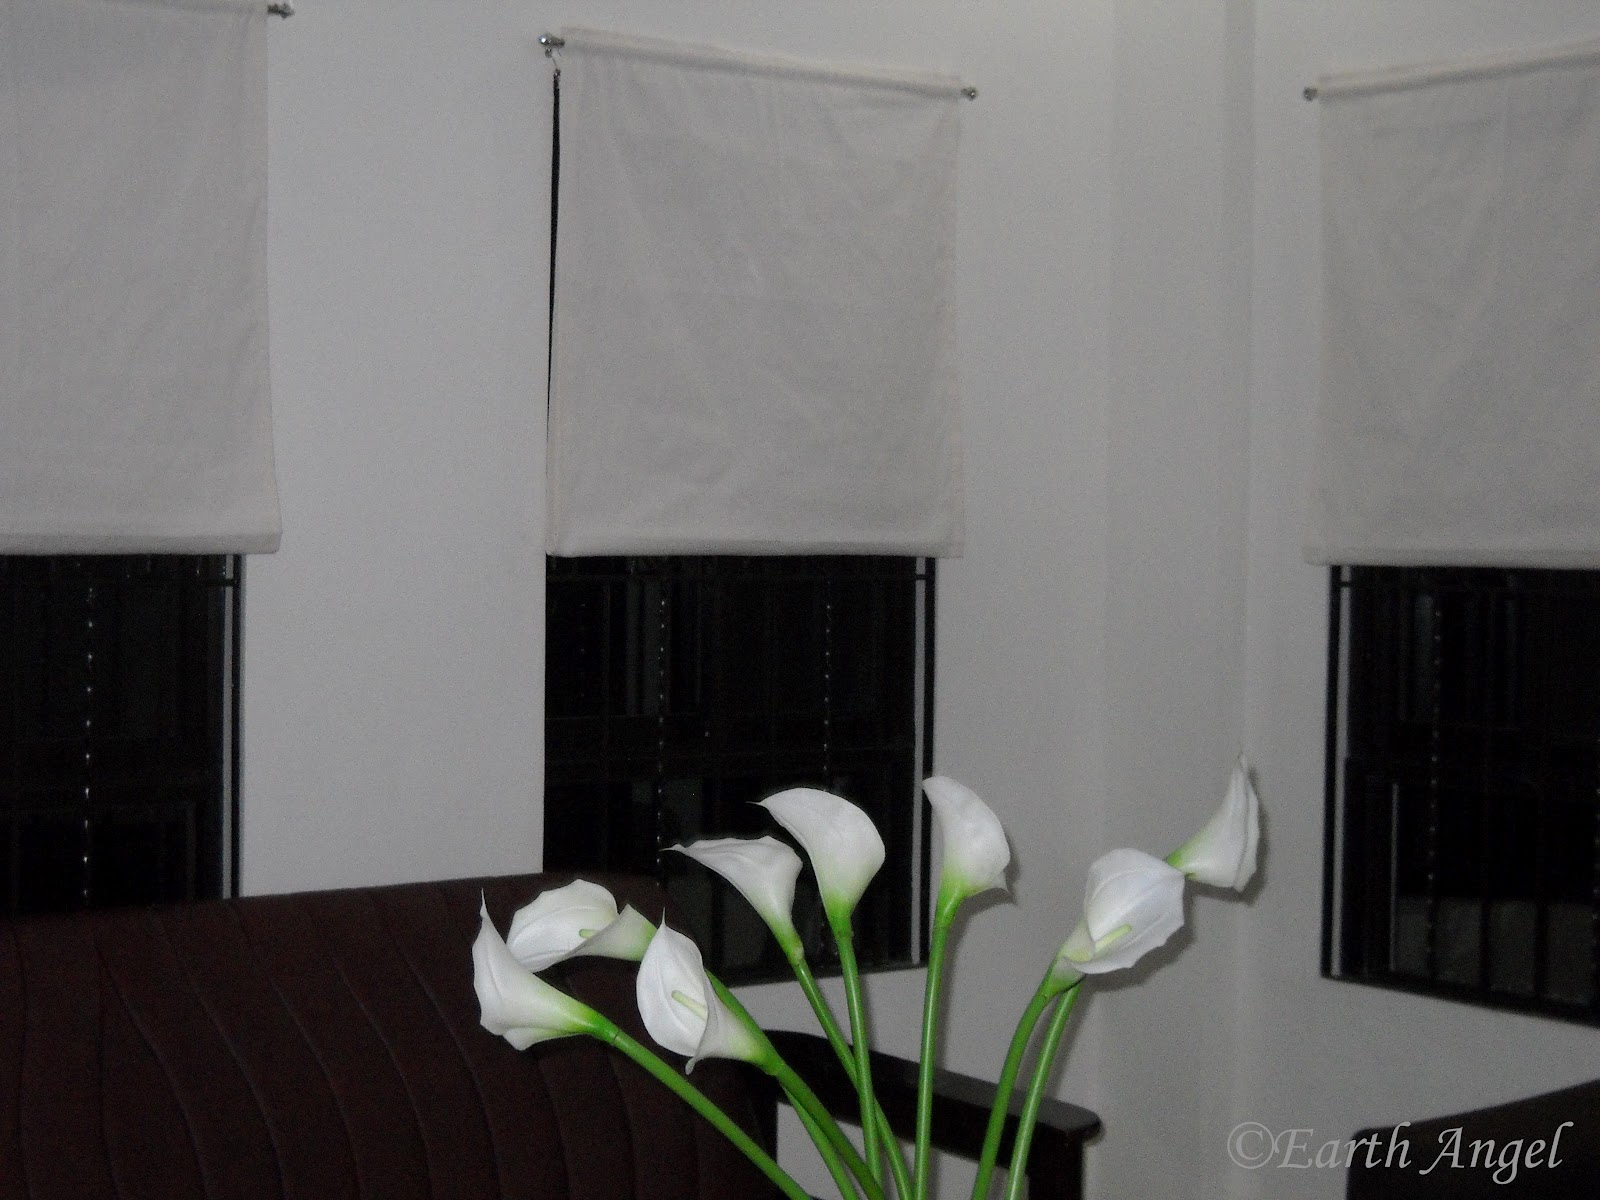 Earth Angel Diy Minimalist Window Treatment